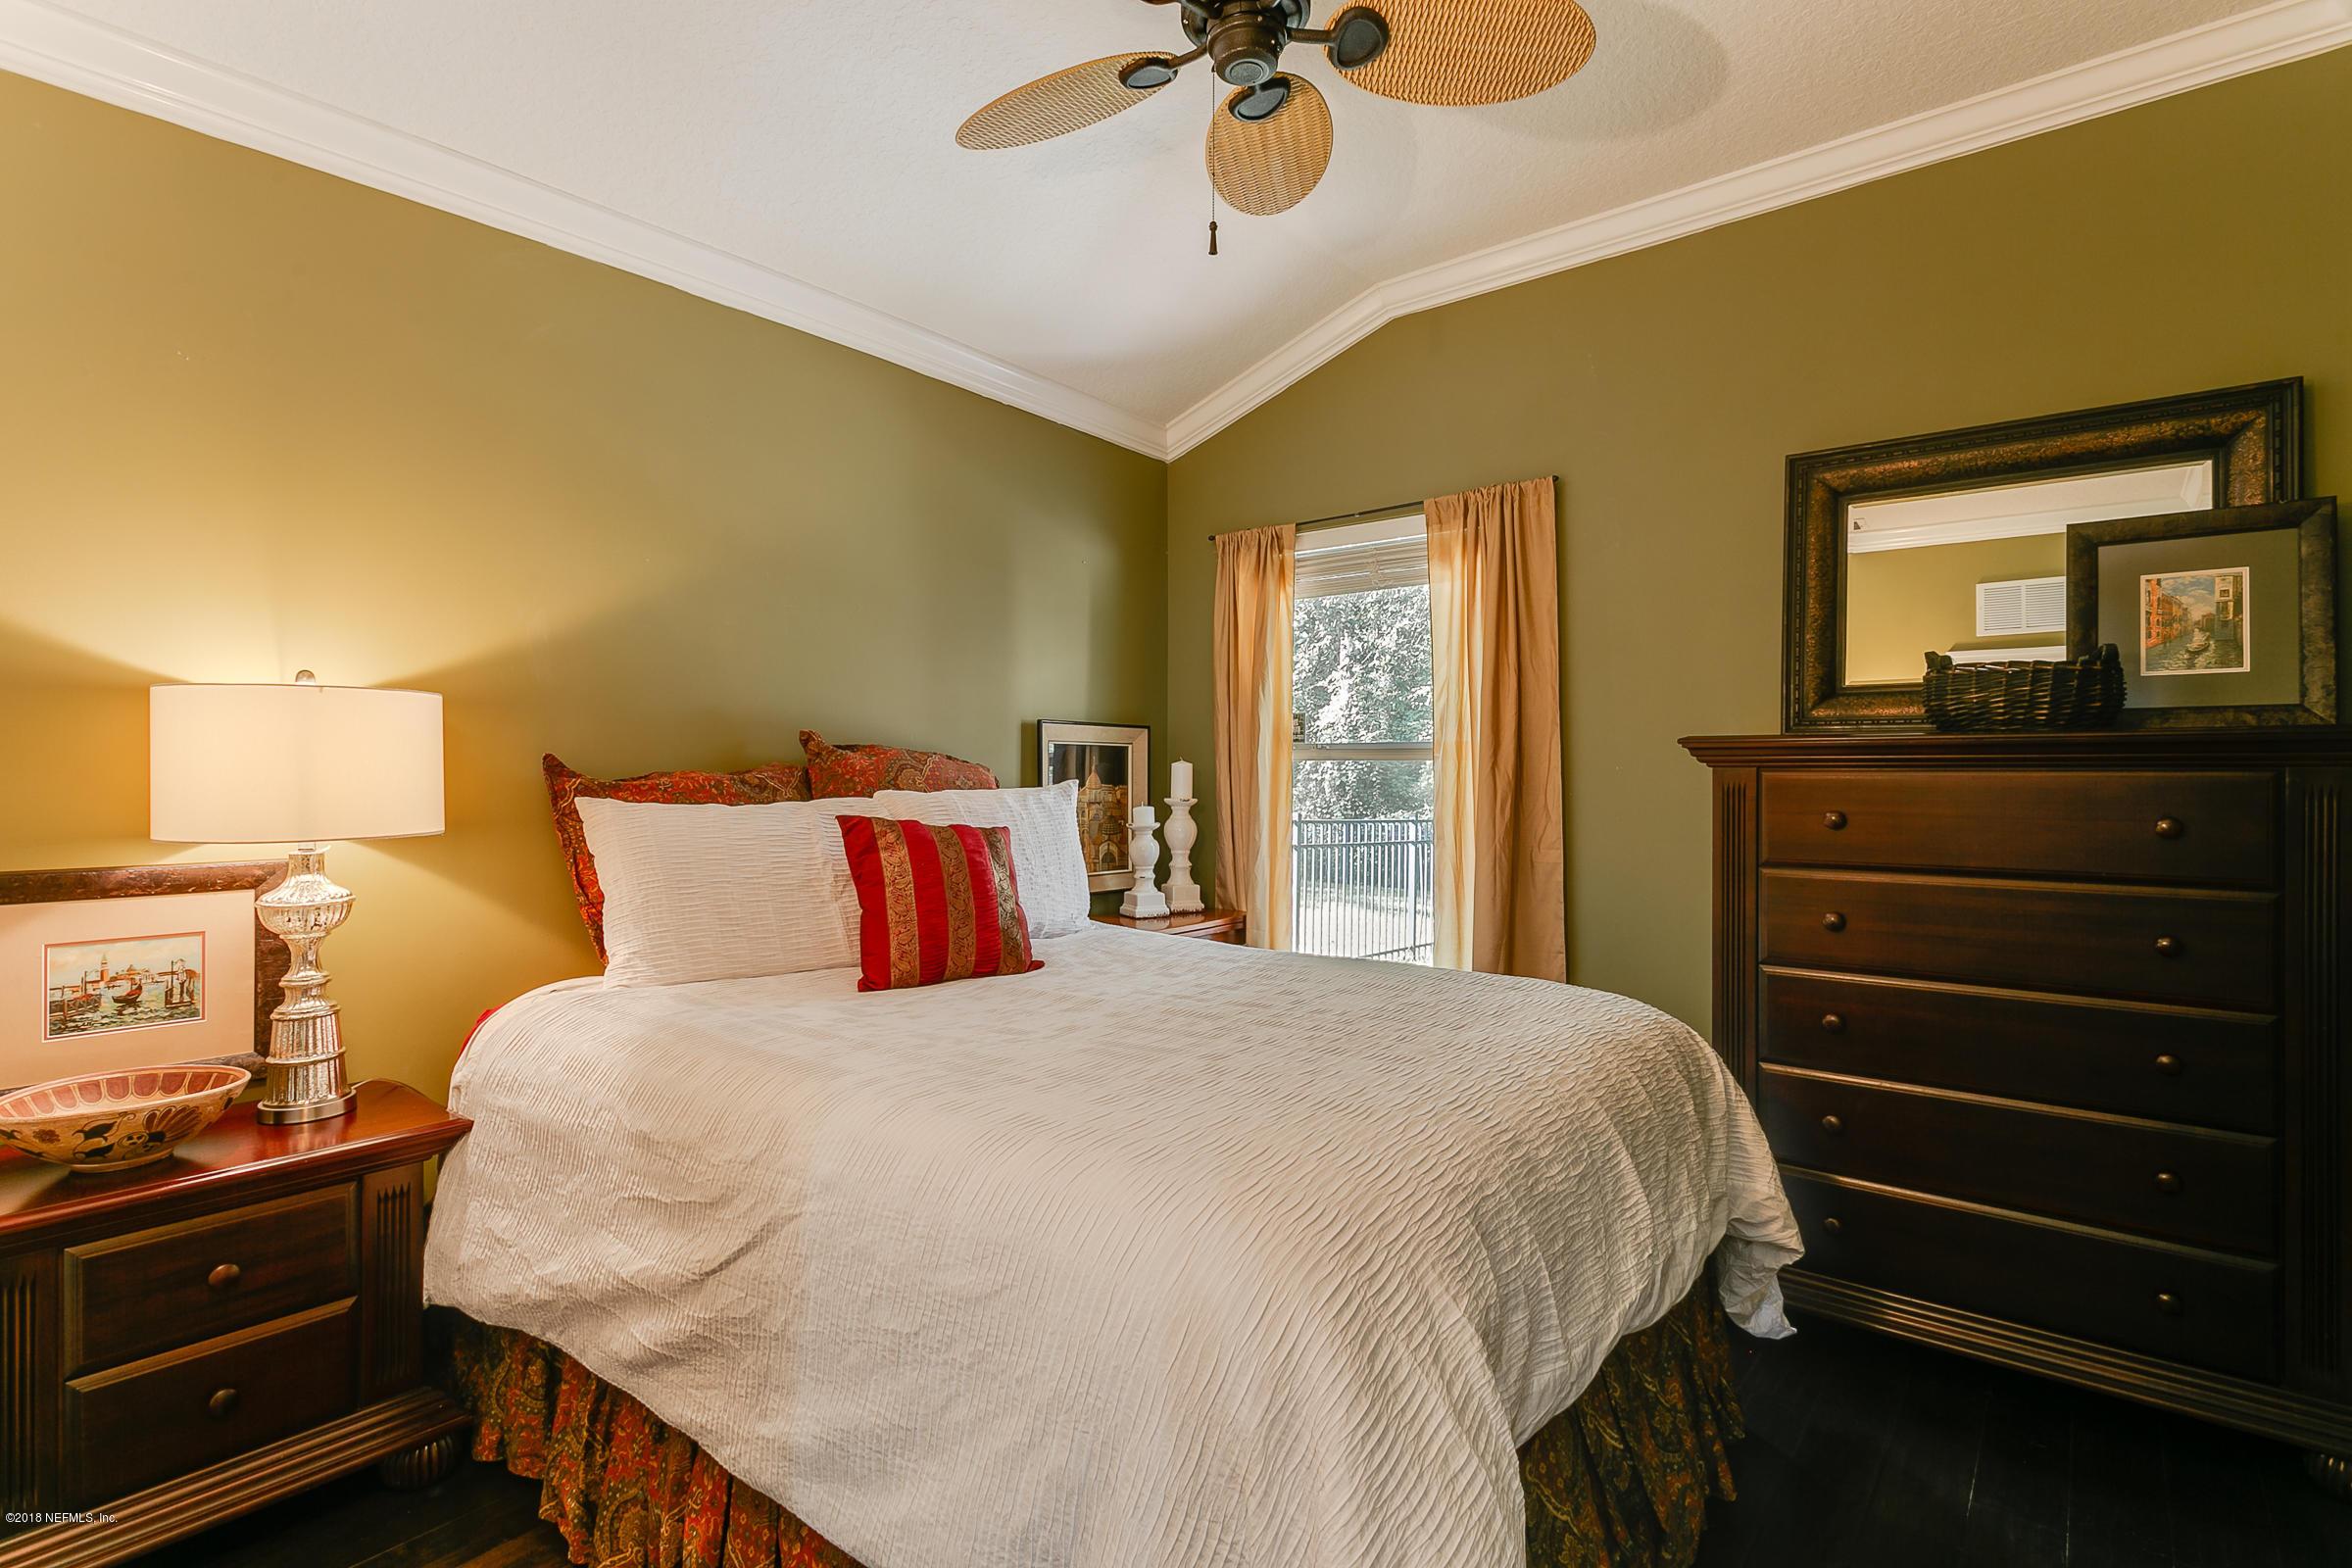 6436 GINNIE SPRINGS, JACKSONVILLE, FLORIDA 32258, 4 Bedrooms Bedrooms, ,2 BathroomsBathrooms,Residential - single family,For sale,GINNIE SPRINGS,951618